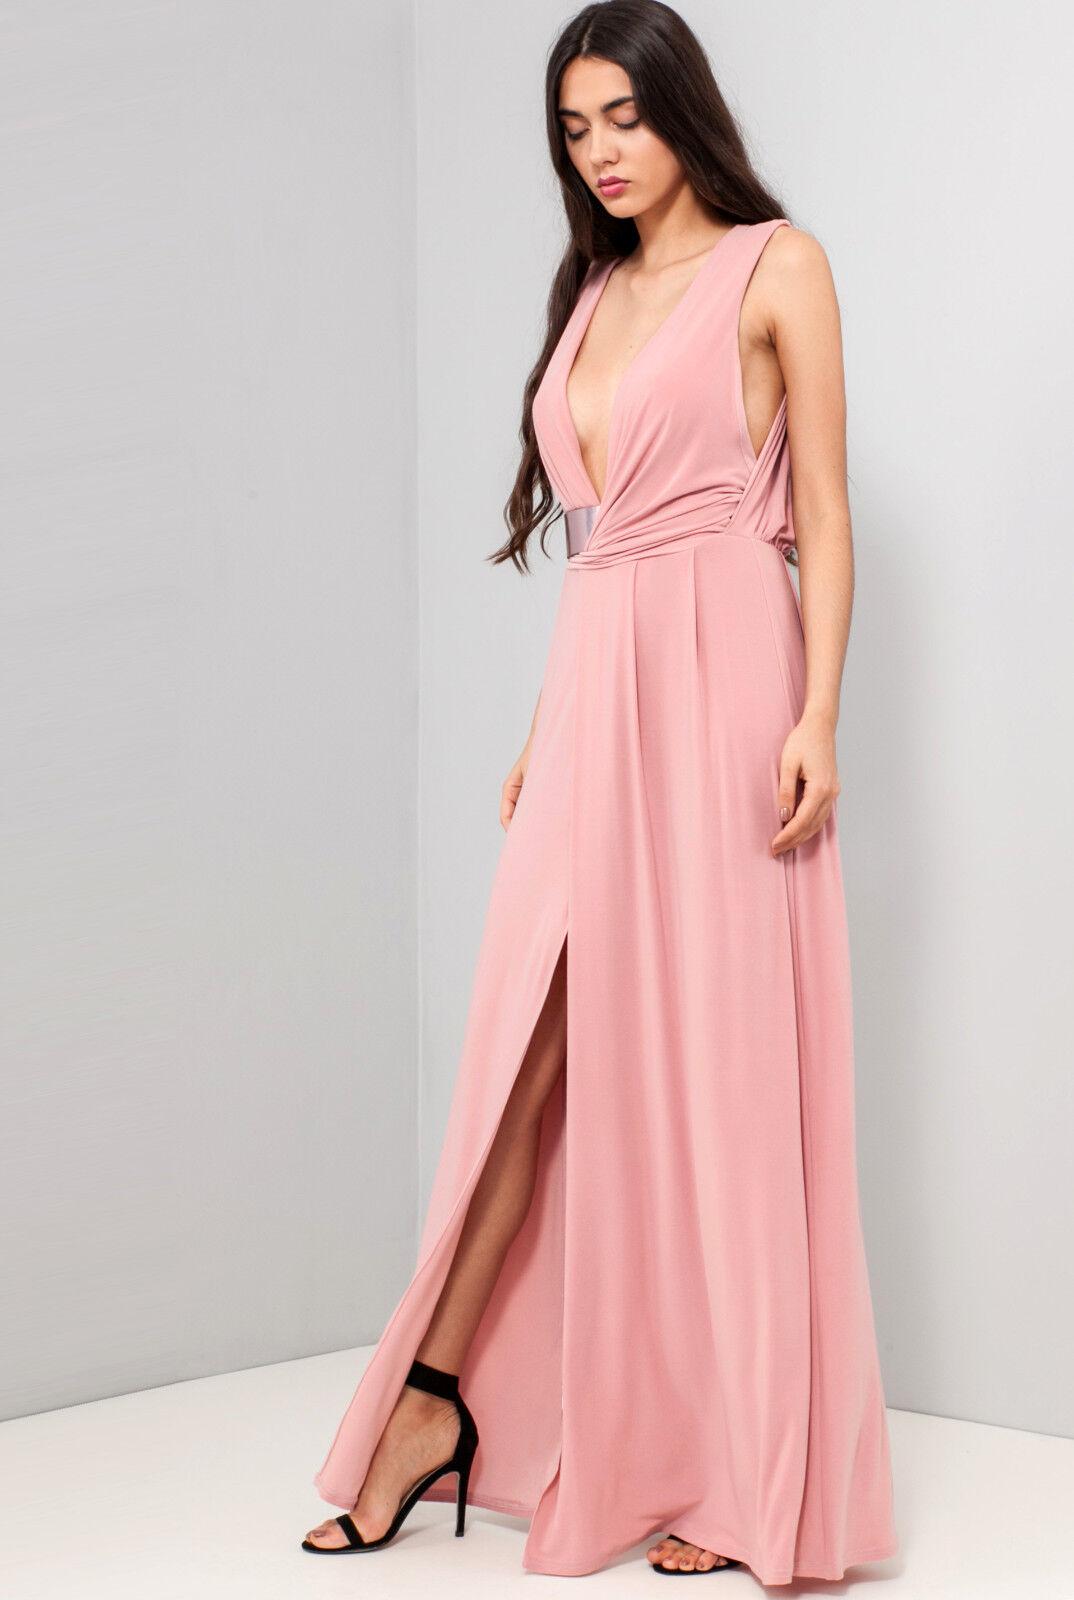 c1055a29574e7 ASOS Drape V Neck Belted Maxi Dress. RRP £65.00 £17.99 + Free Postage